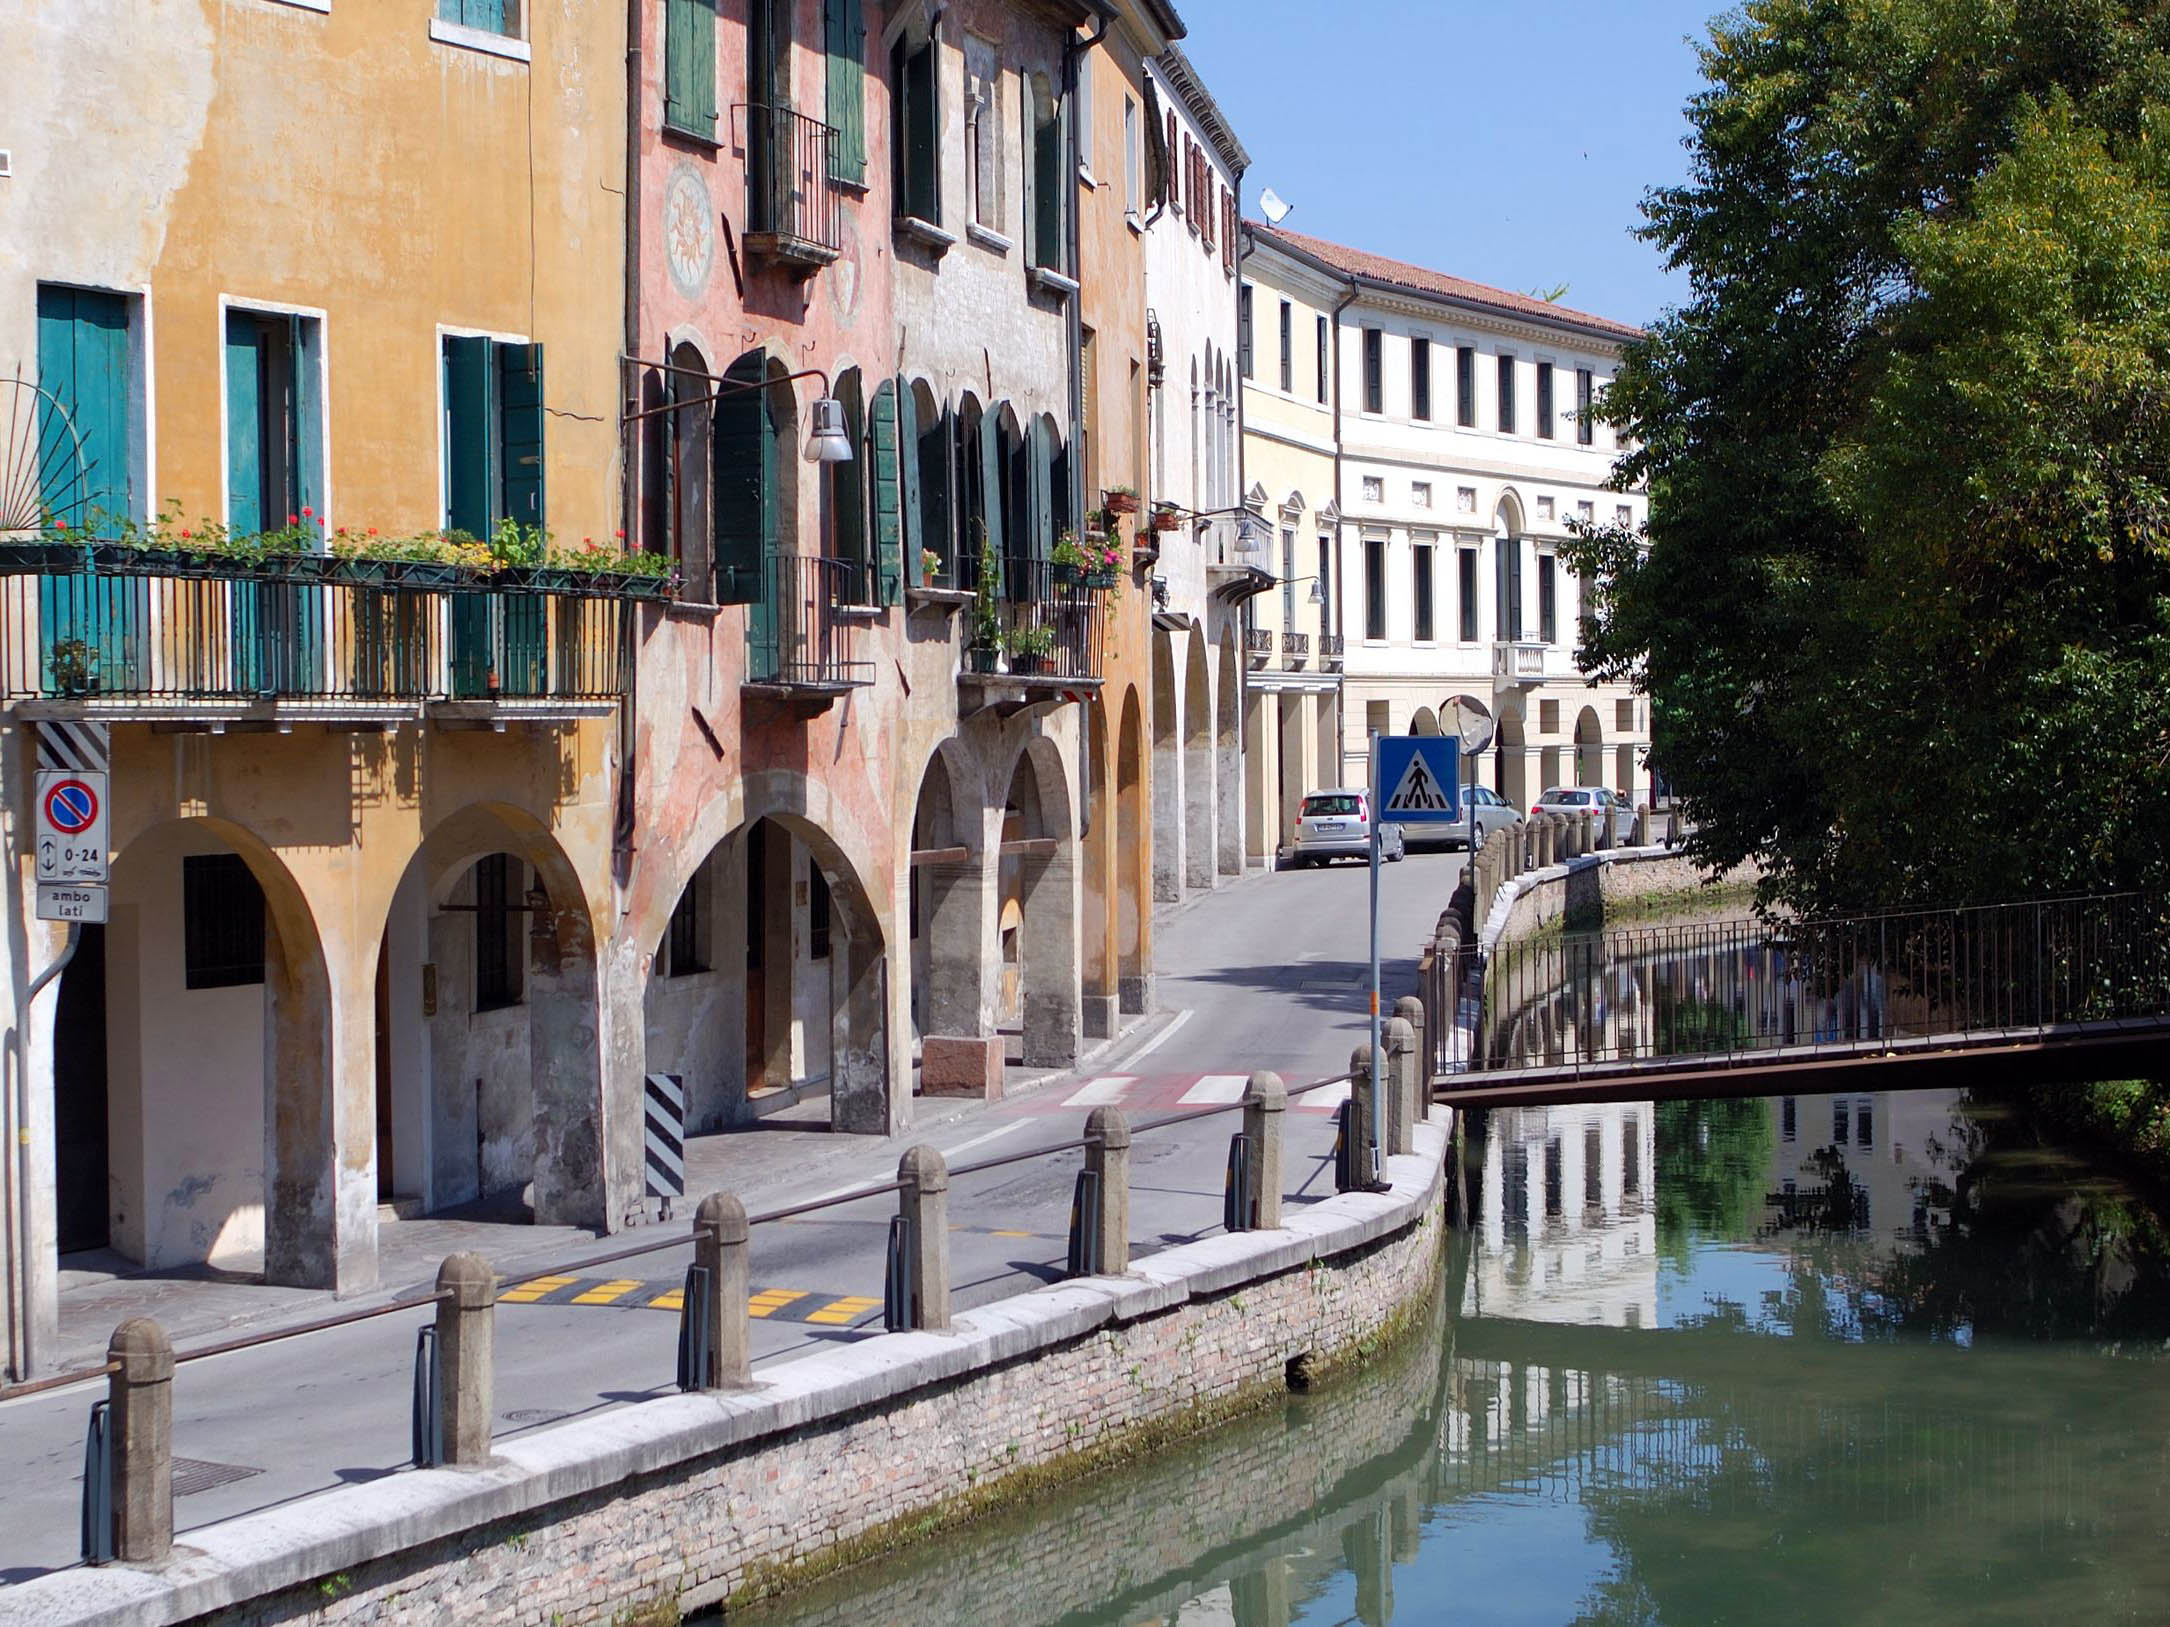 Canale a Treviso, Tour Treviso Urbs Picta, la città dipinta